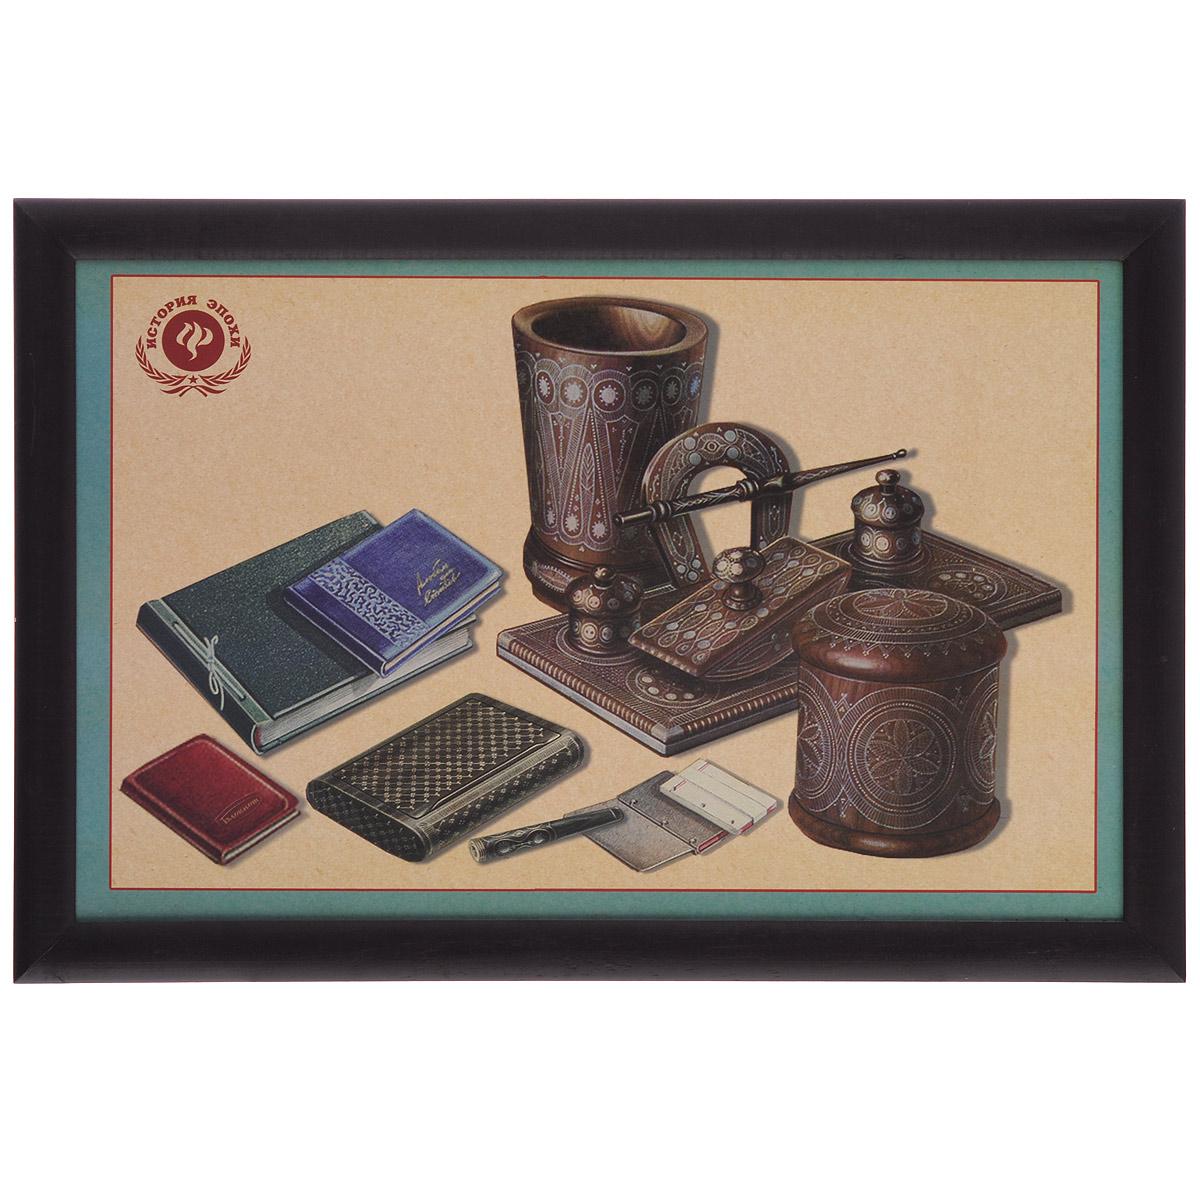 канцелярия Поднос-столик Феникс-презент Ретро-канцелярия, с мягким основанием, 41 х 28 см 37376